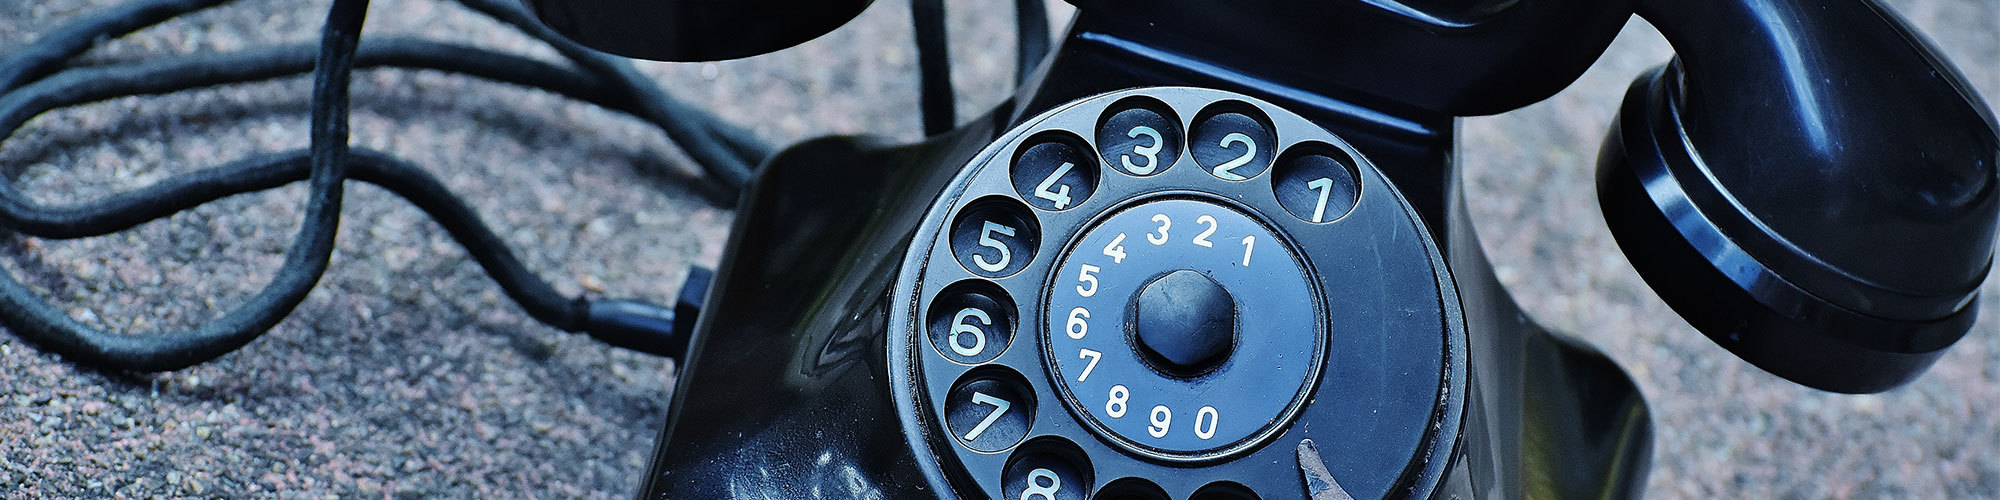 Phone header 2